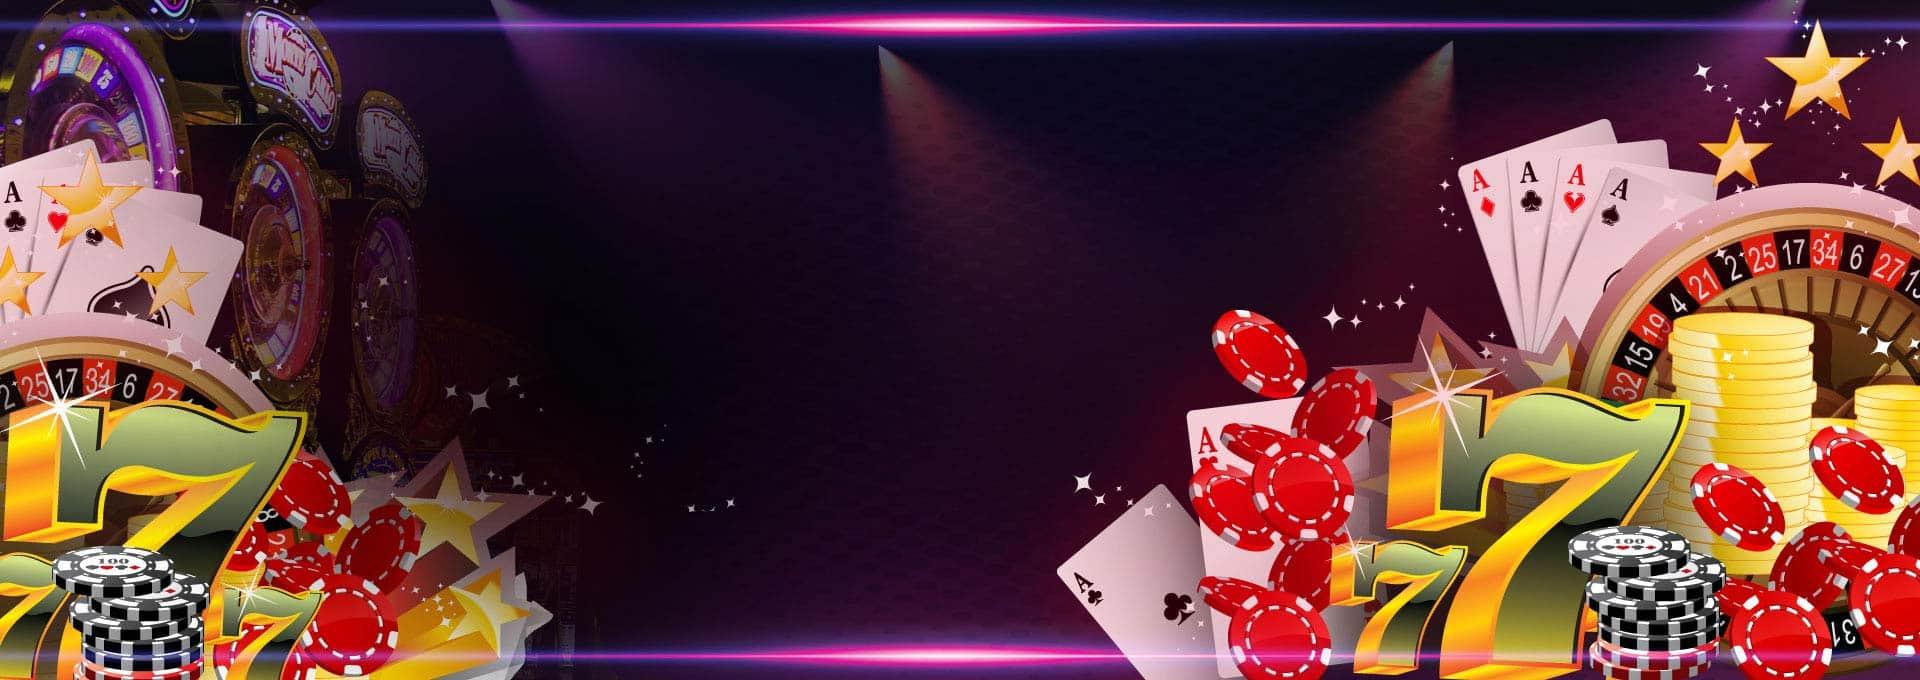 Casino Online Games Hiring